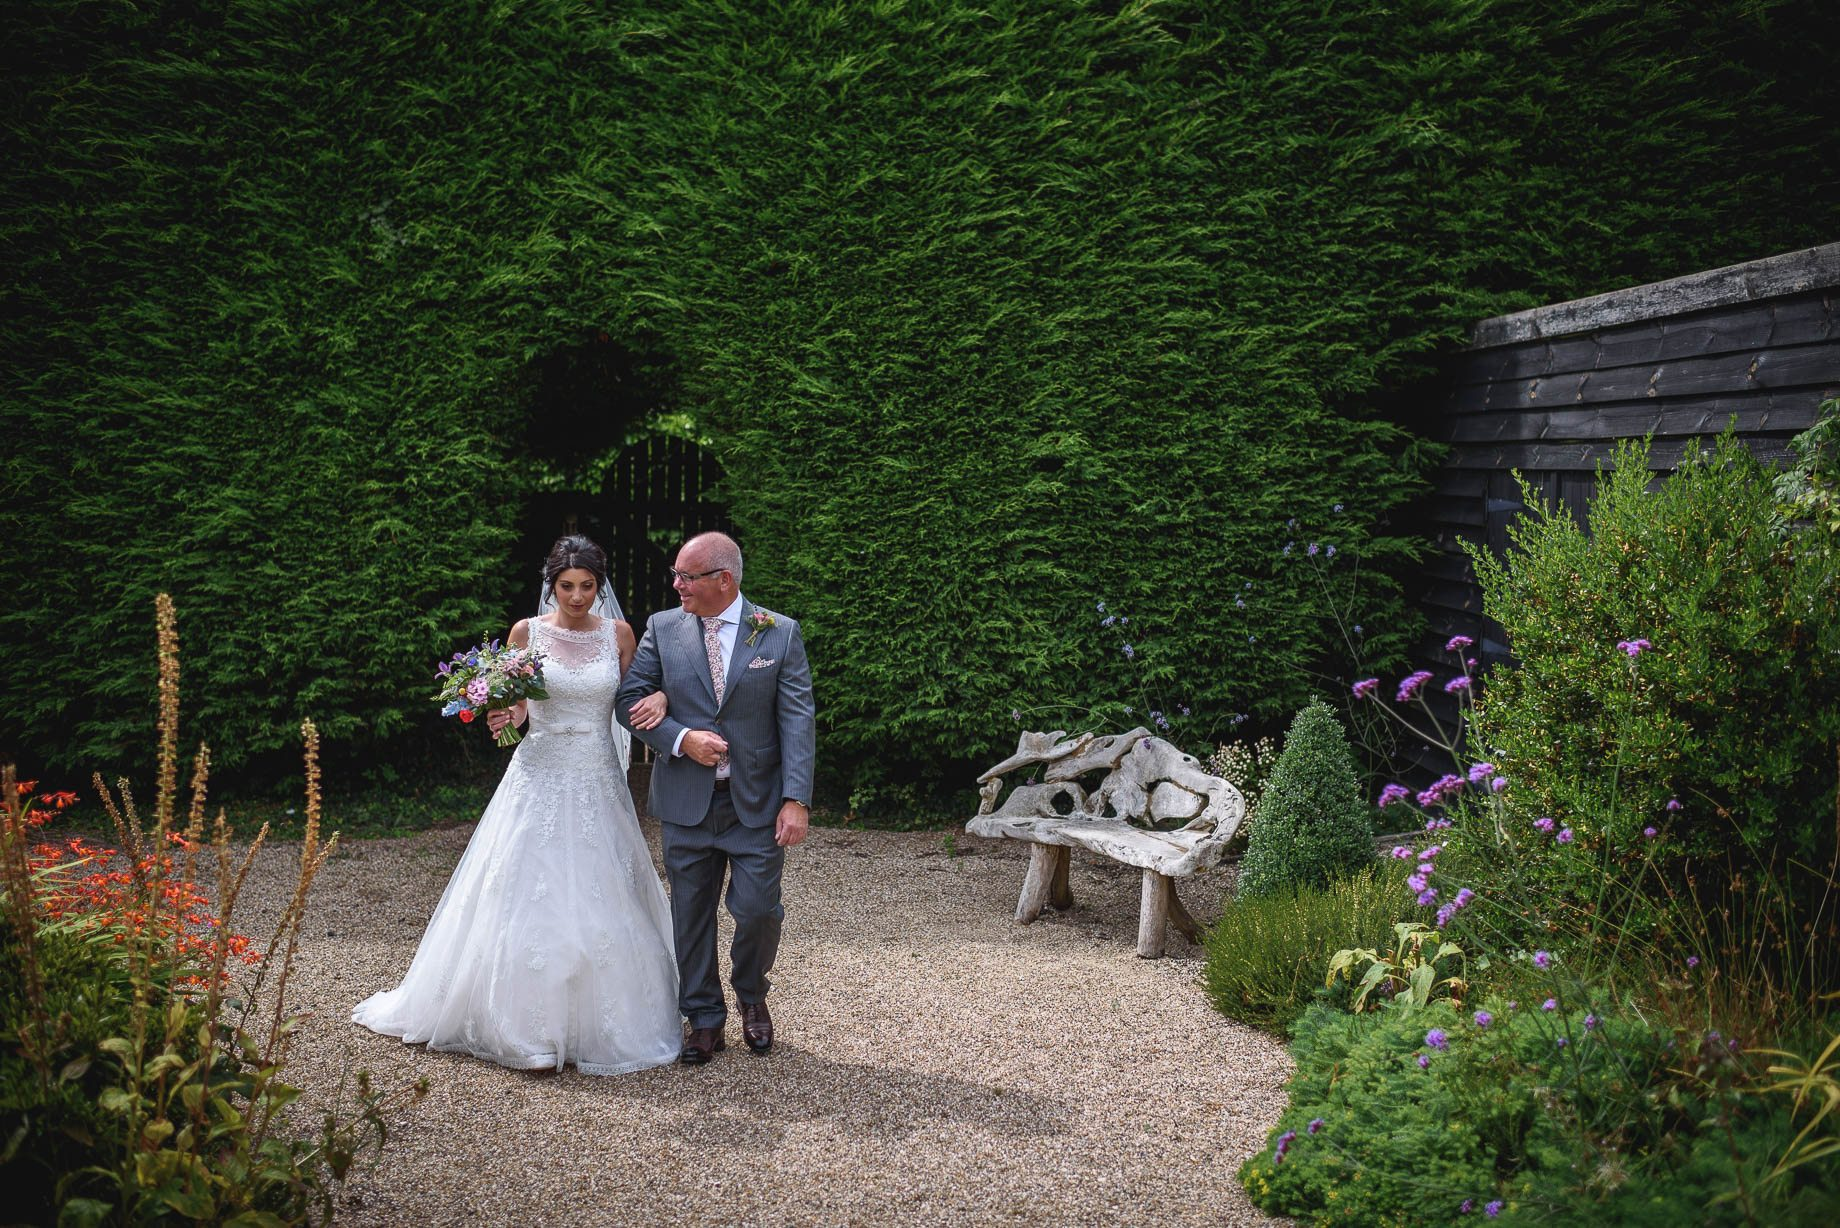 Gaynes Park wedding photography - Guy Collier Photography - Rachel and Jon (61 of 169)